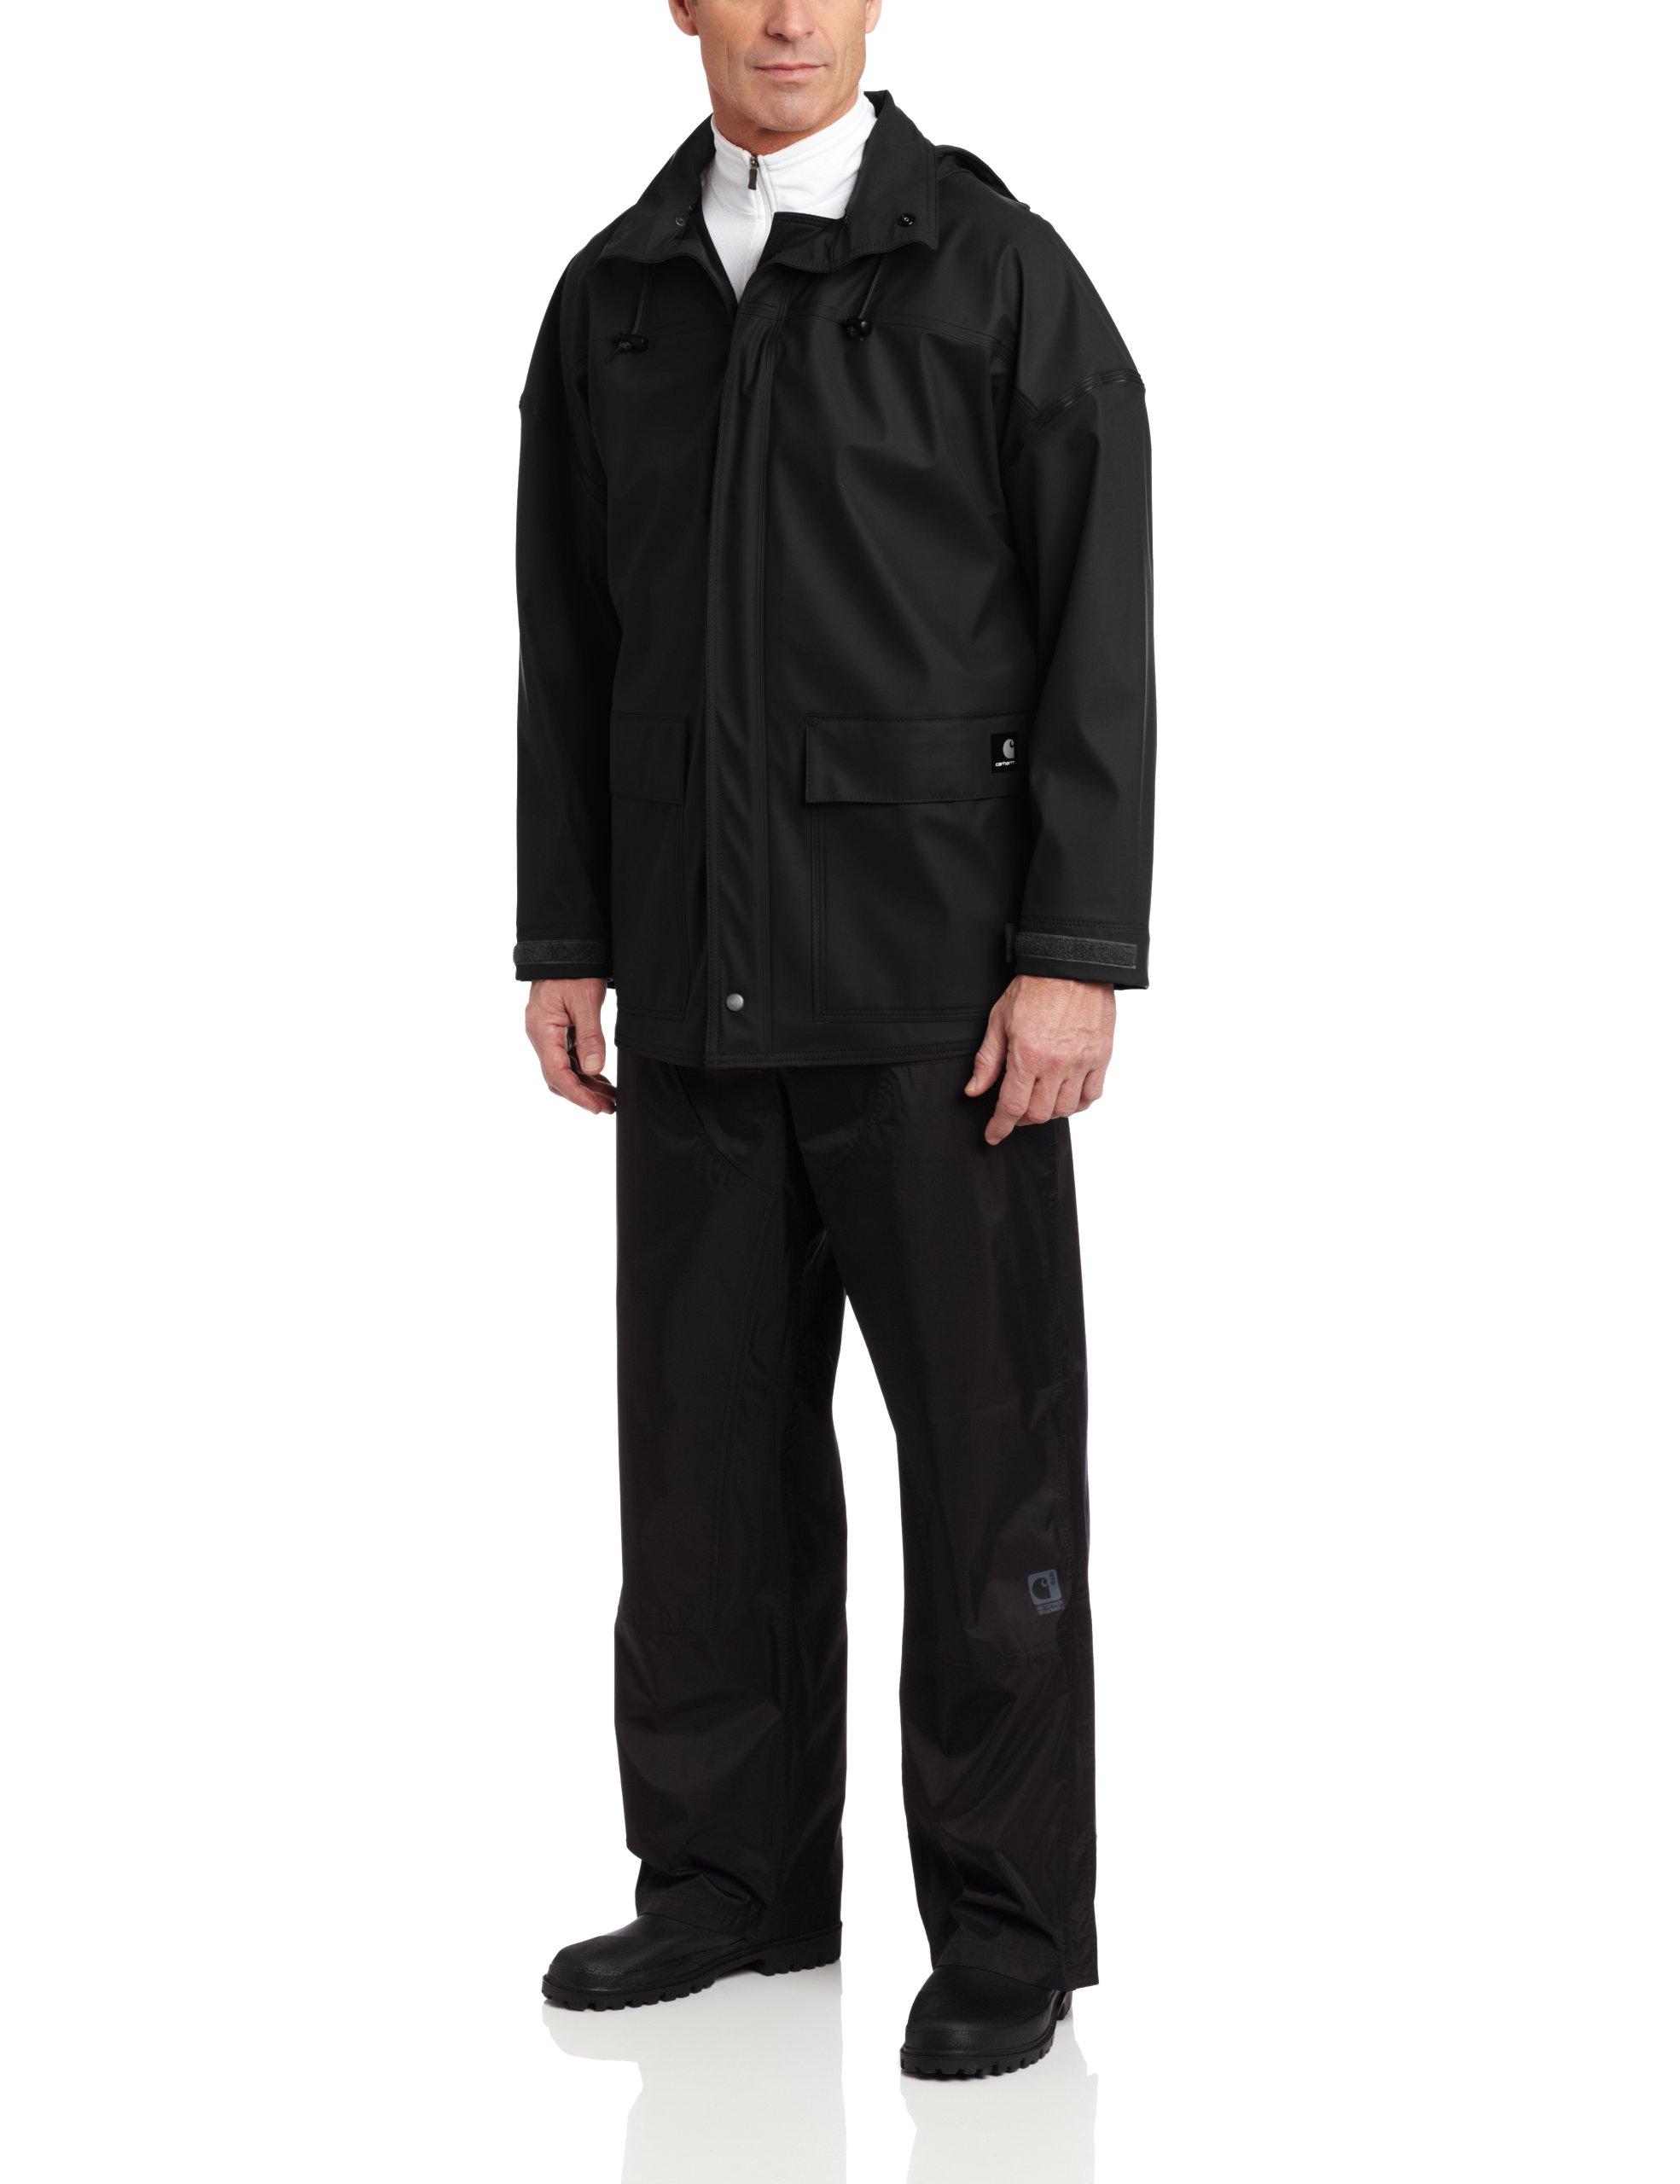 Carhartt Men's Medford Rain Defender Coat,Black,Large